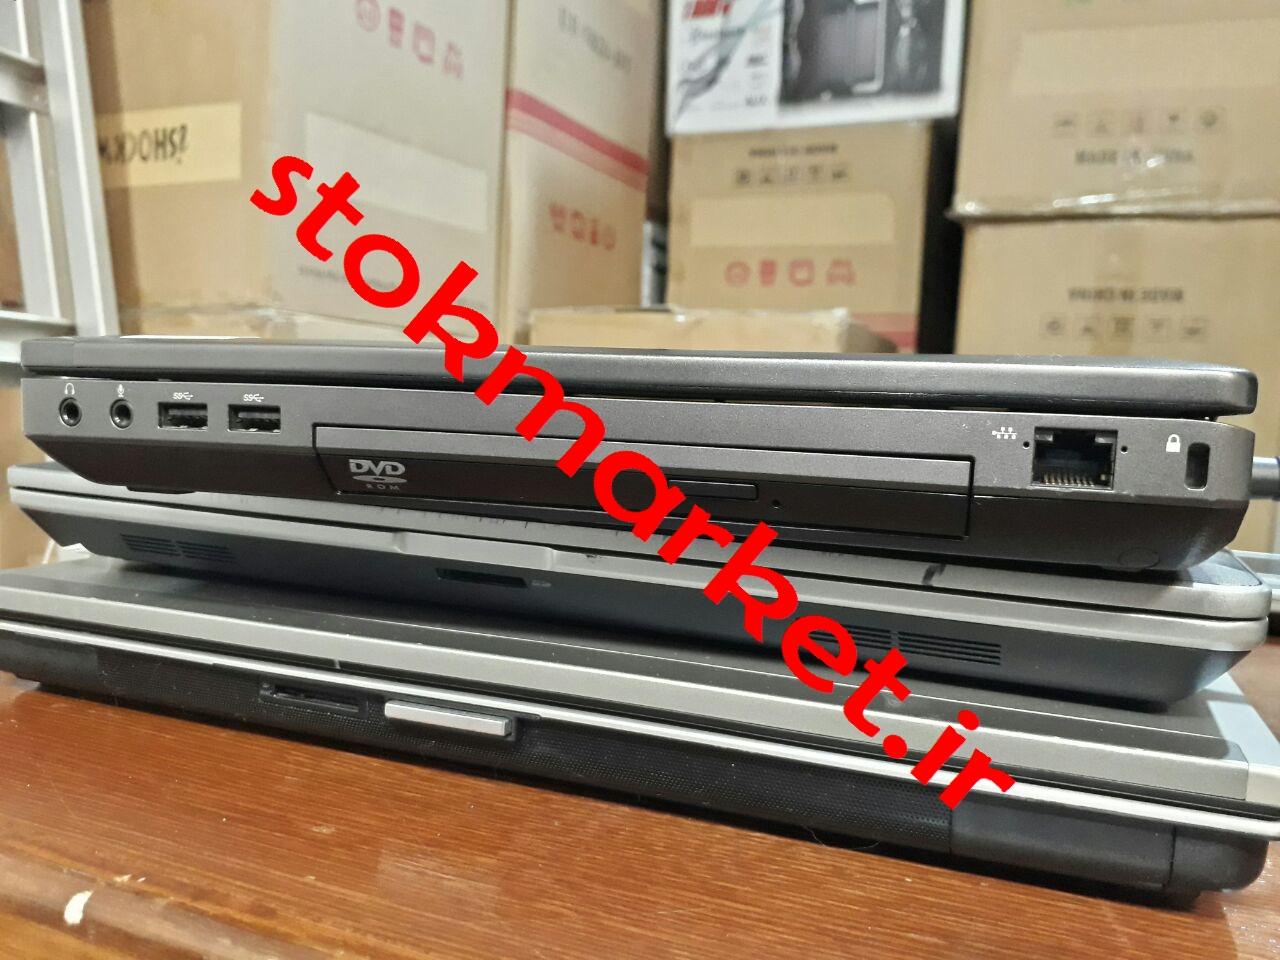 لپ تاپ دست دوم اچ پی مدل hp 6570b